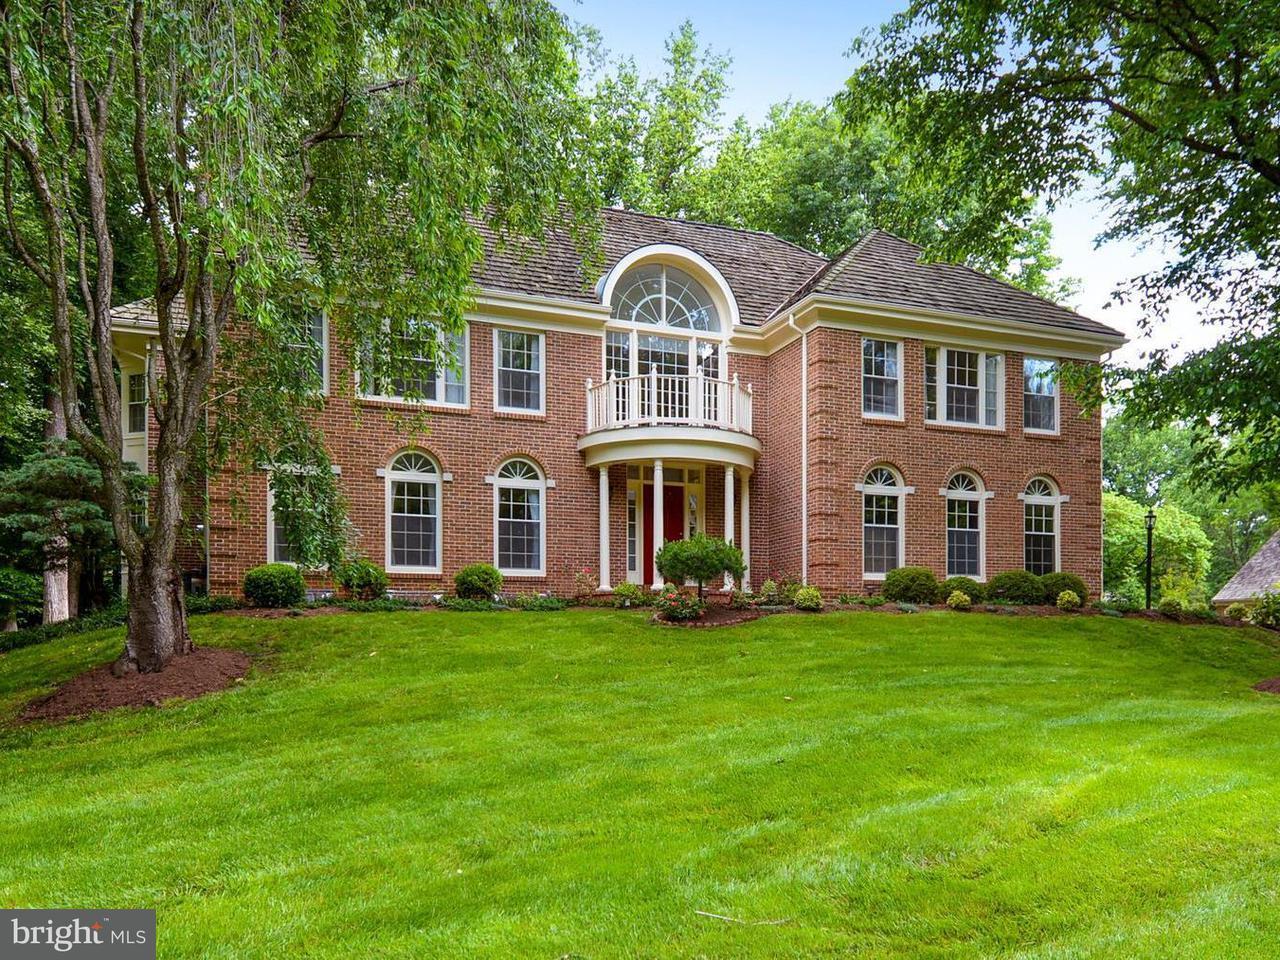 Single Family Home for Sale at 6505 Deidre Ter 6505 Deidre Ter McLean, Virginia 22101 United States